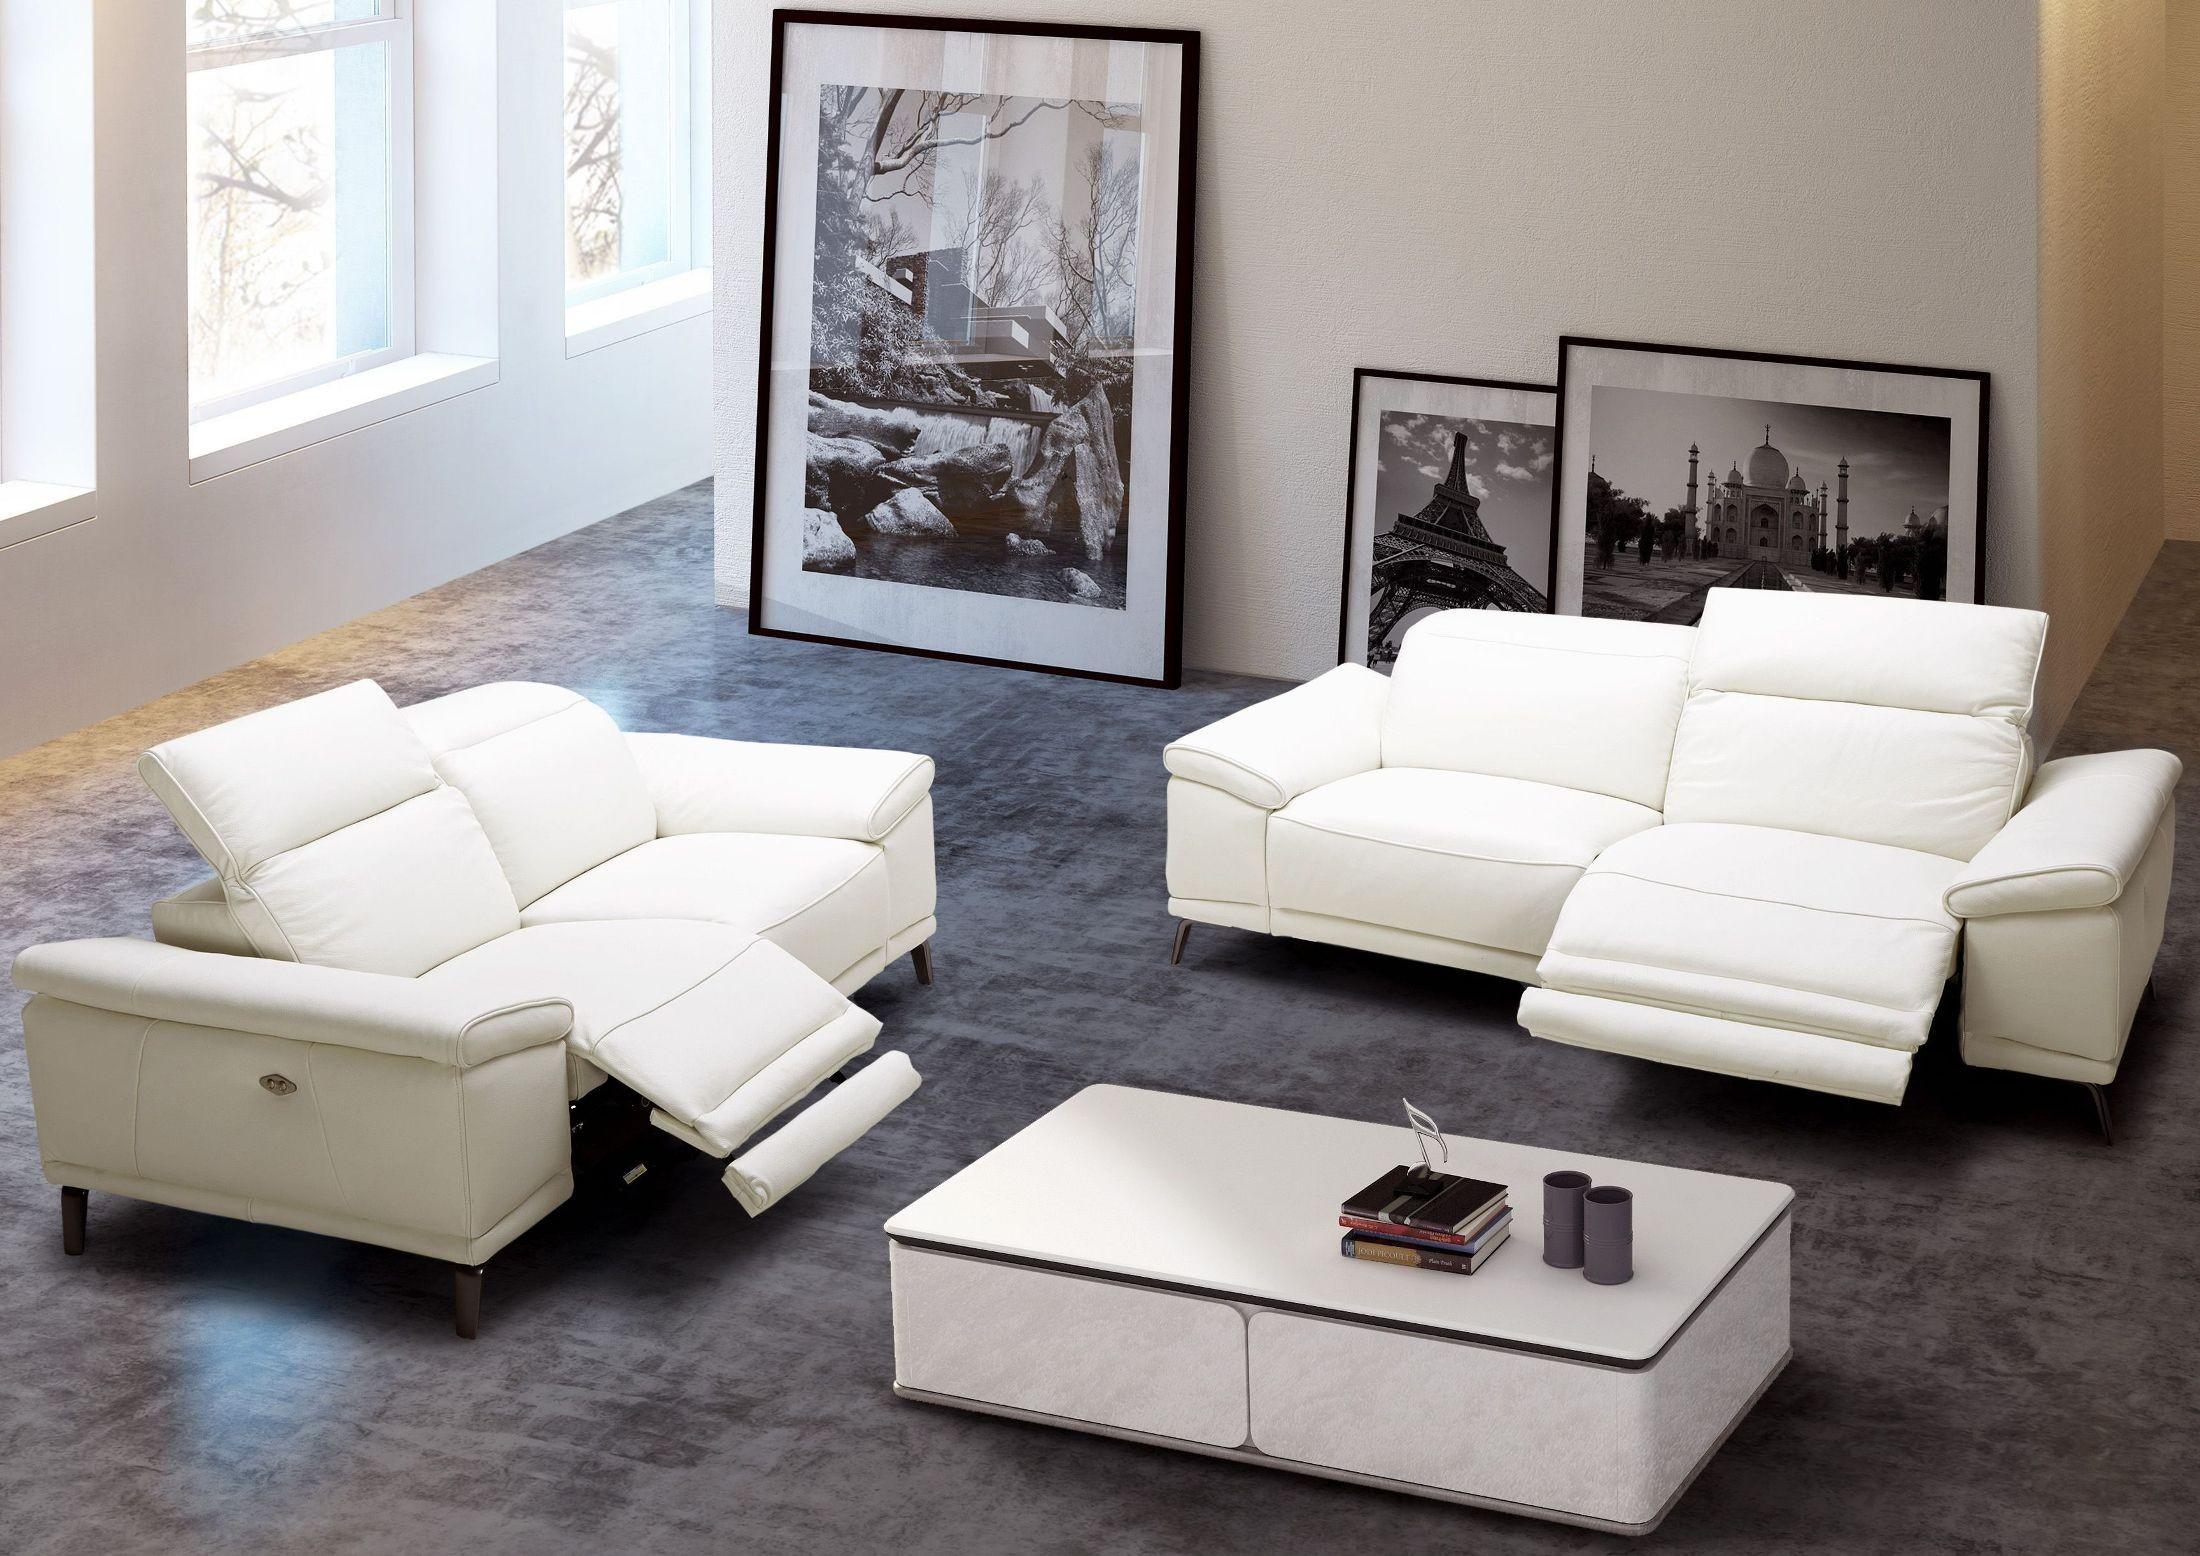 gaia white leather power reclining living room set 18253 s j m. Black Bedroom Furniture Sets. Home Design Ideas